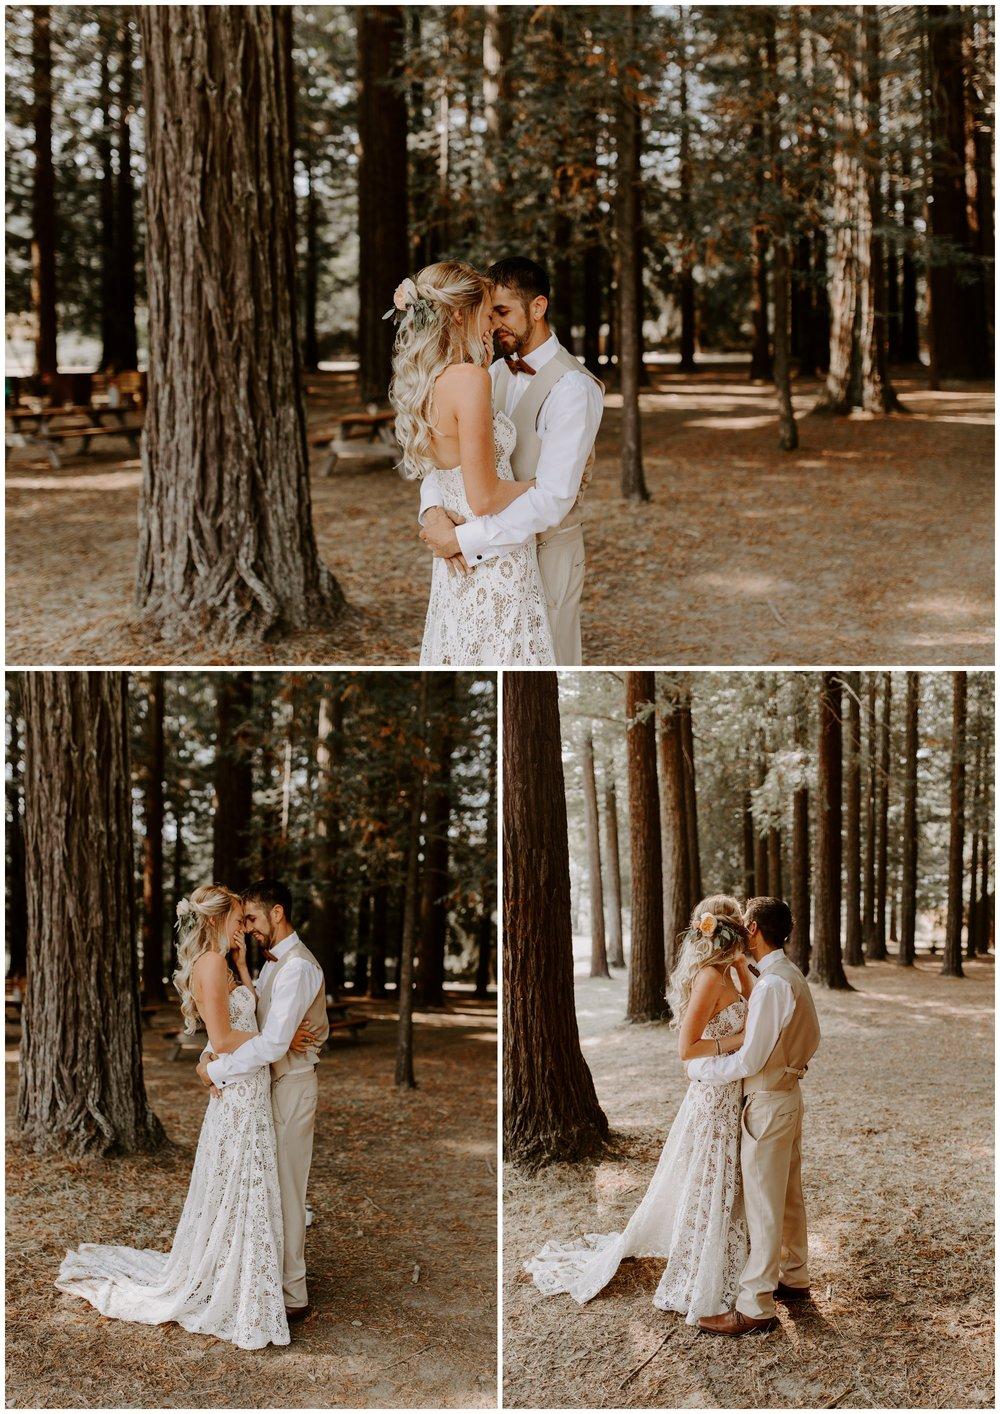 Redwood Festival Wedding Humbolt California - Jessica Heron Images_0012.jpg